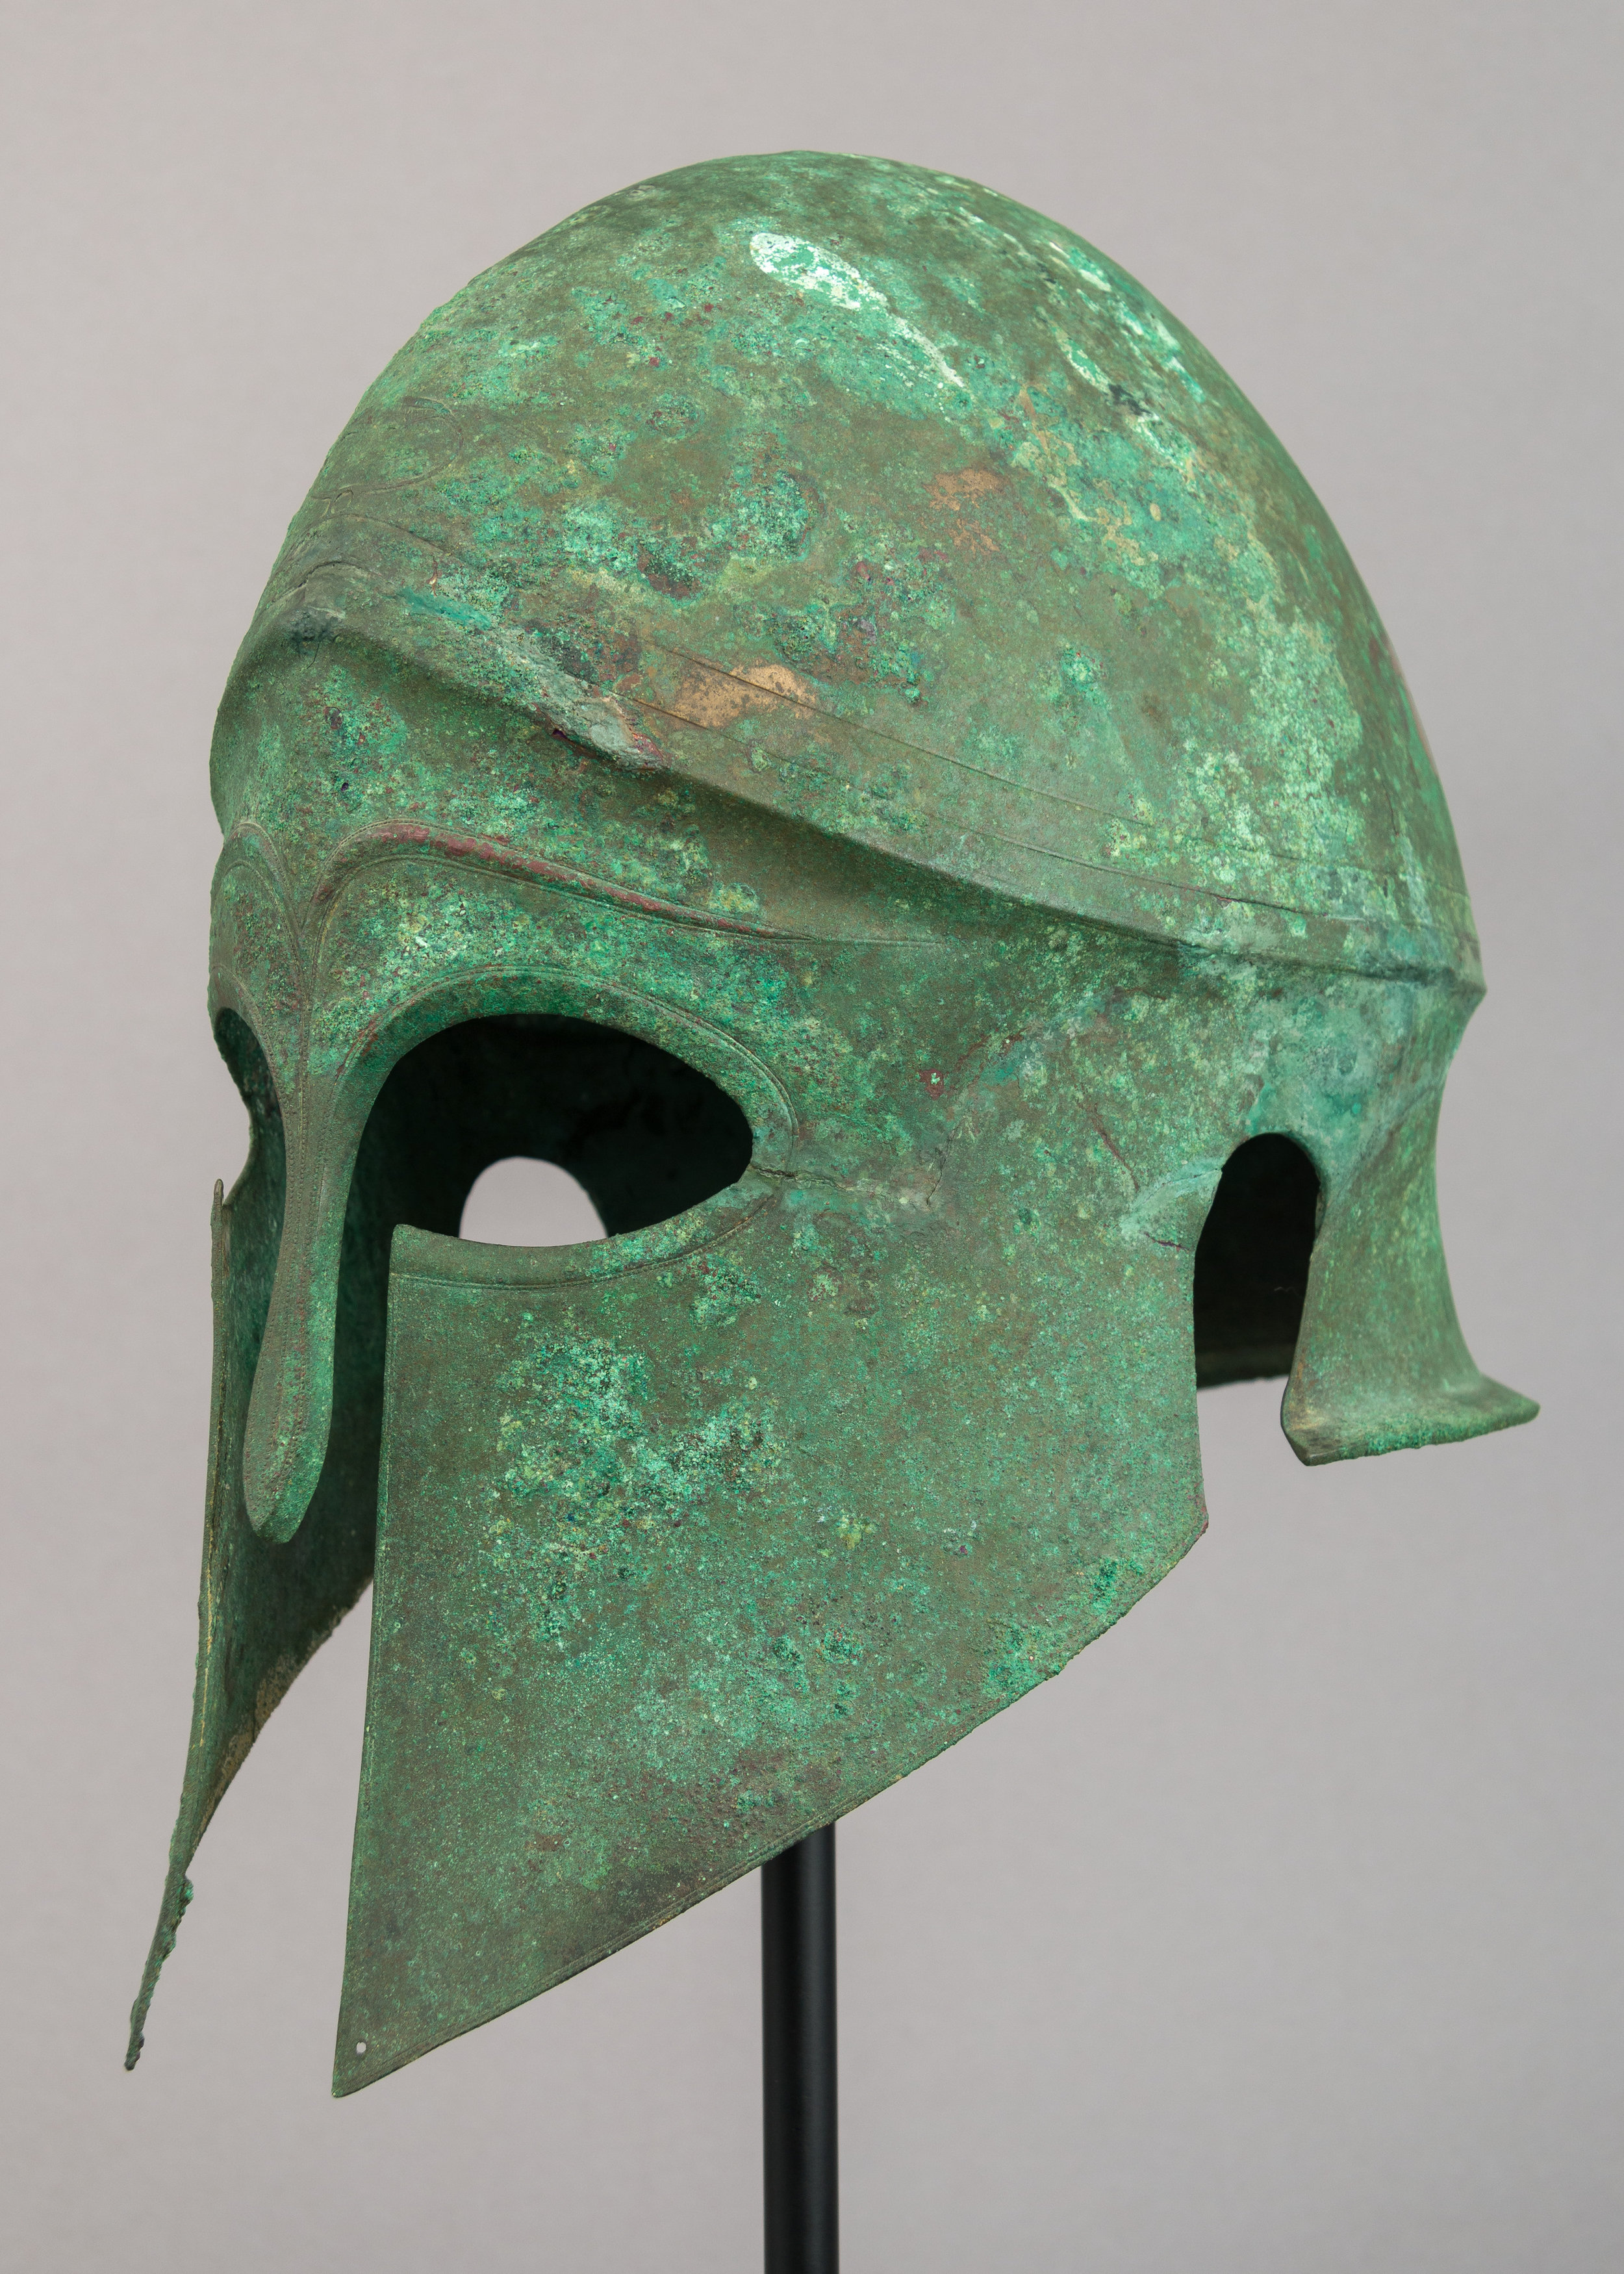 5th Century Bronze Corinthian Helmet - Metropolitan Museum